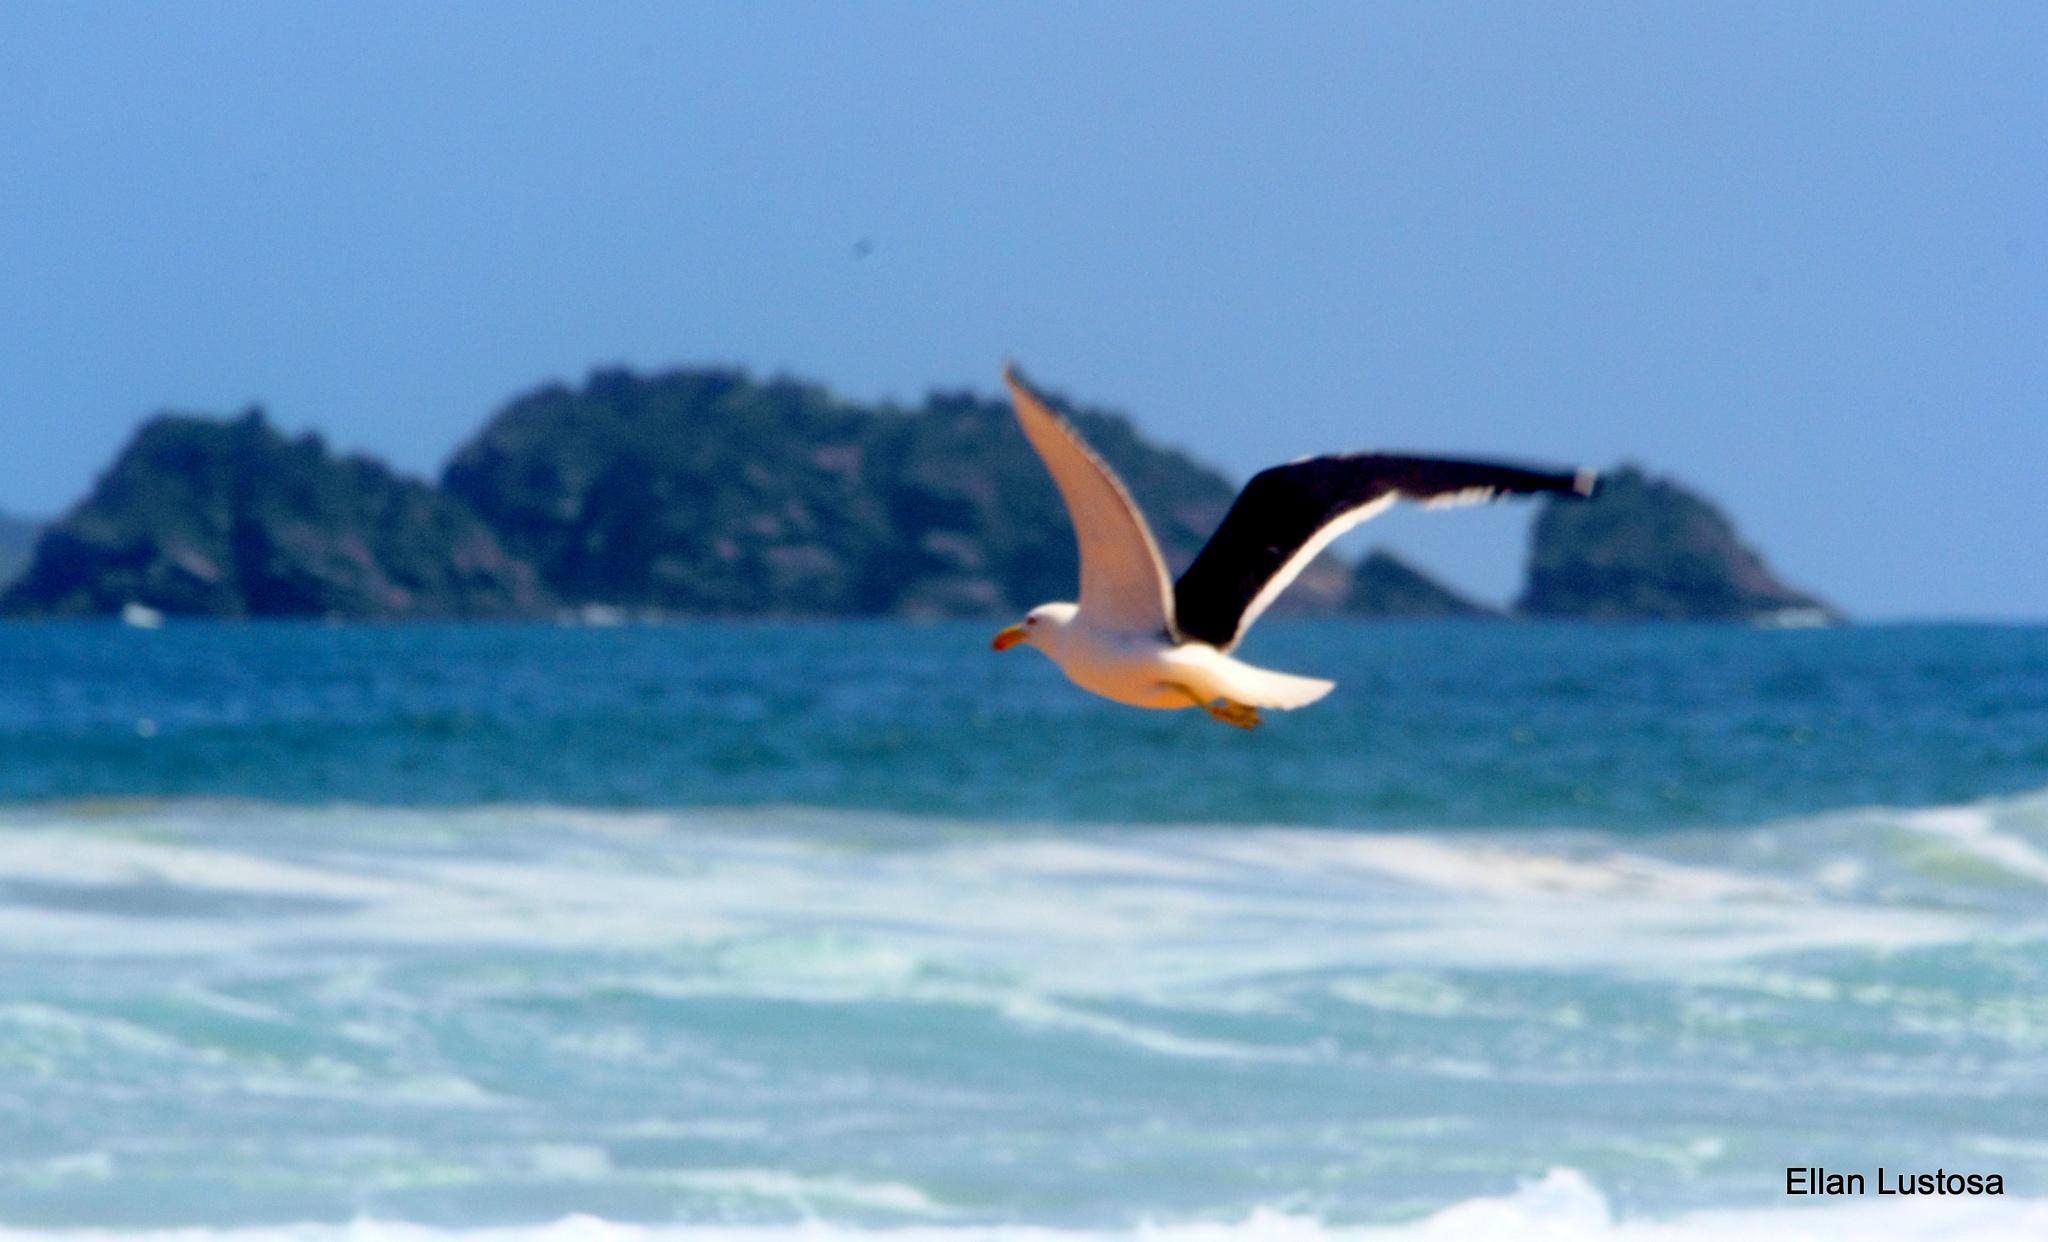 BIRD by Ellan Lustosa Photojournalist